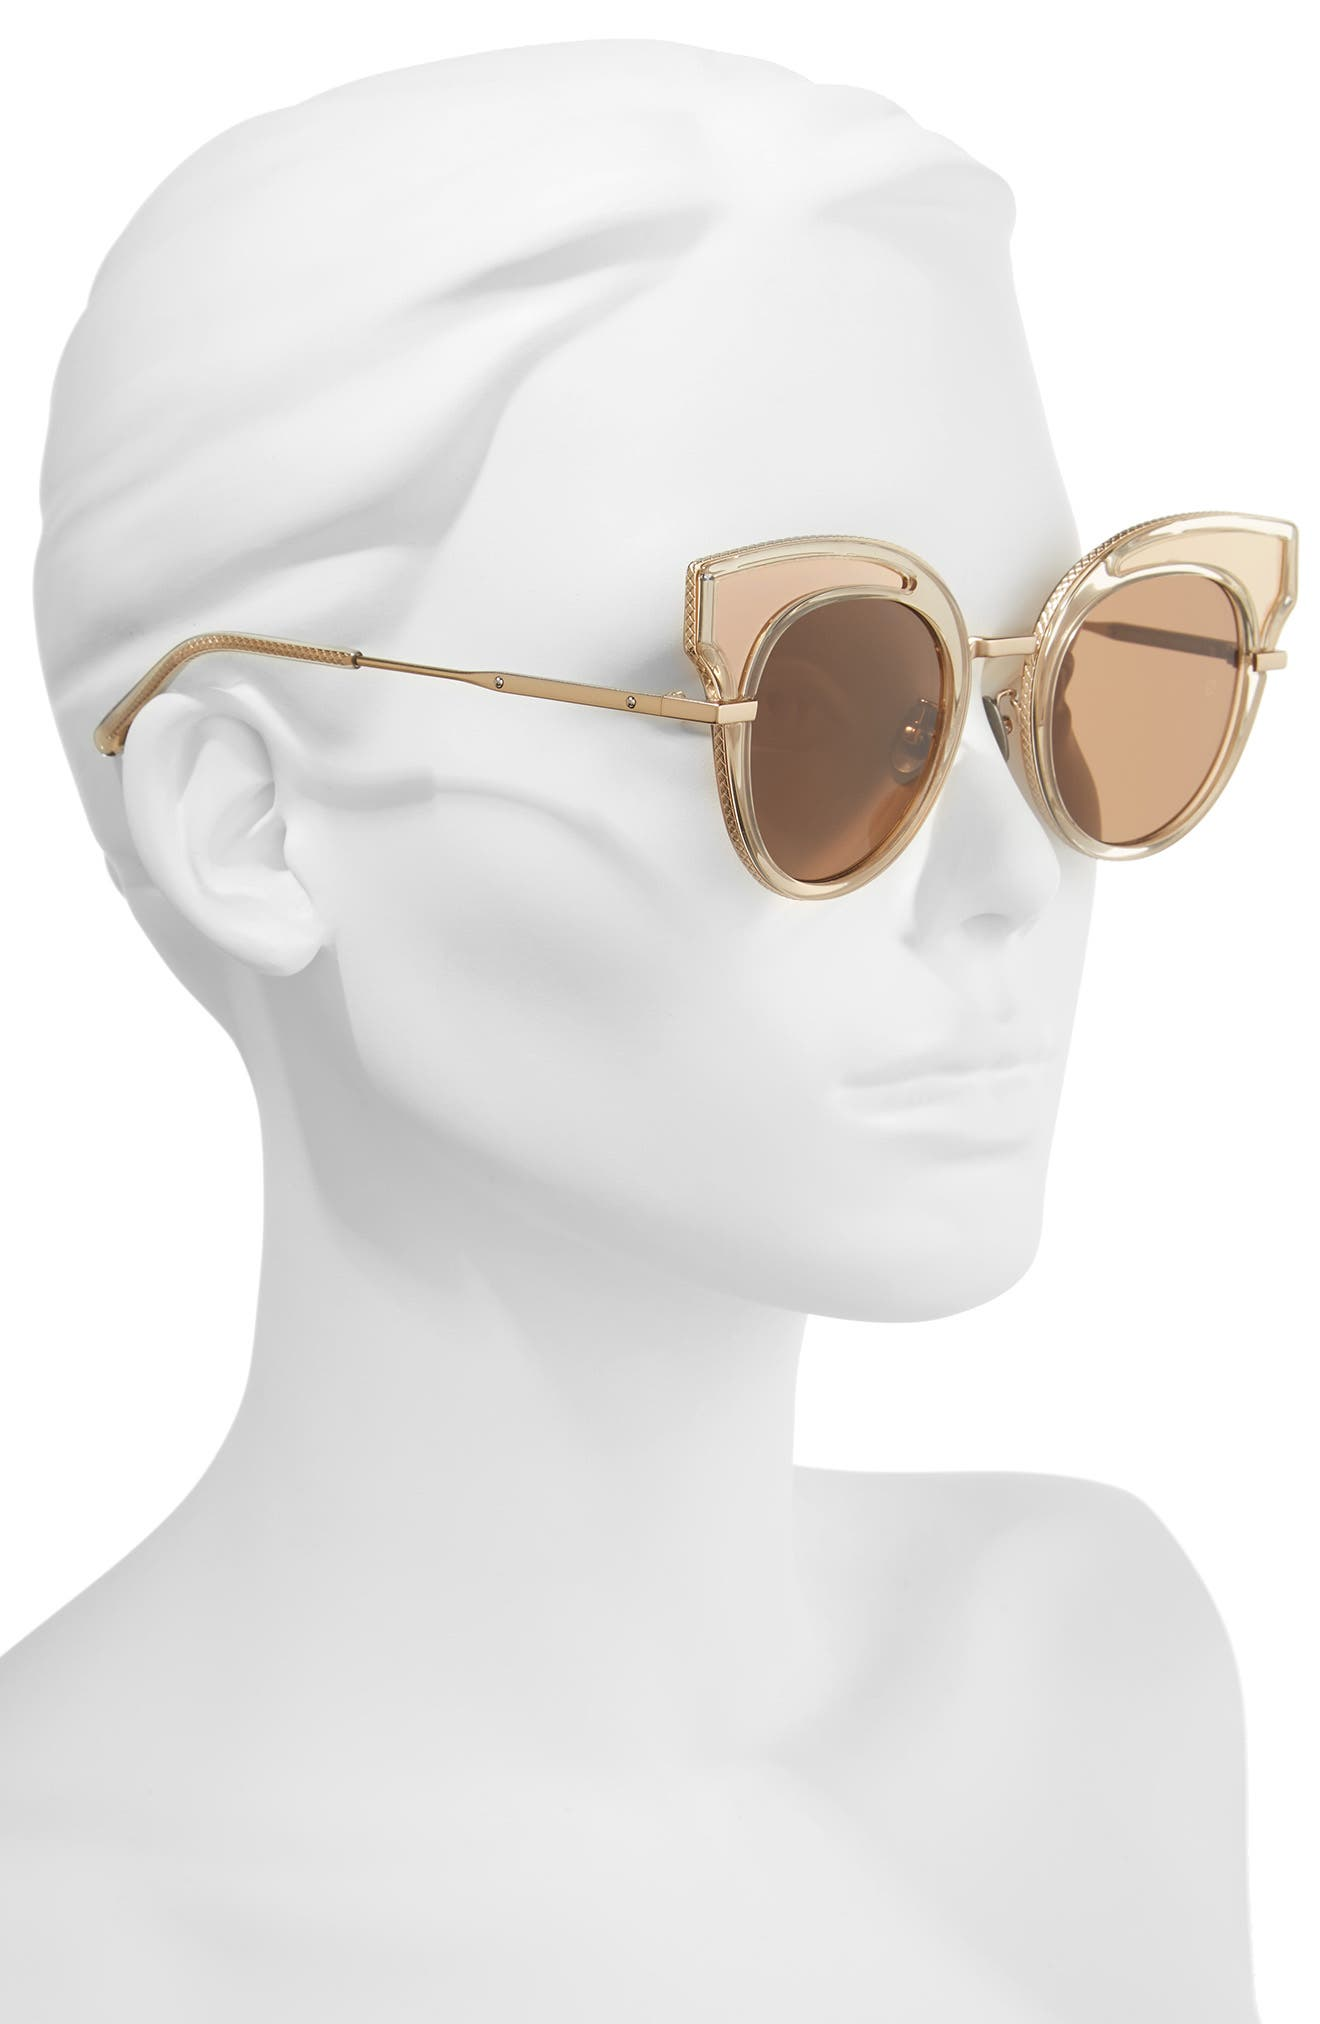 49mm Cat Eye Sunglasses,                             Alternate thumbnail 2, color,                             Yellow